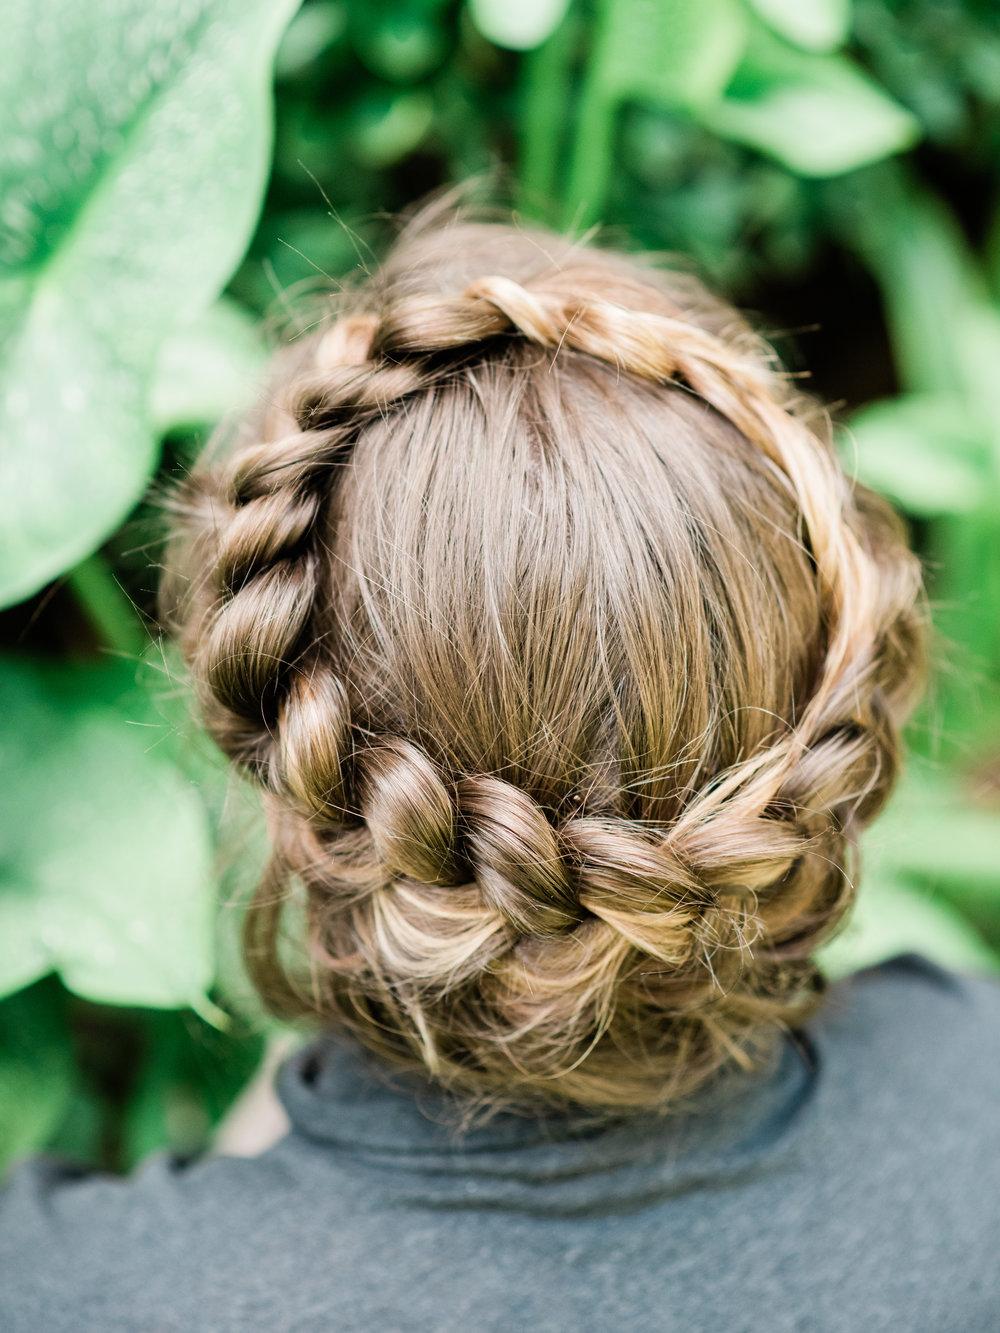 hair-by-hannah-ashley-lauren-photography-9221.jpg